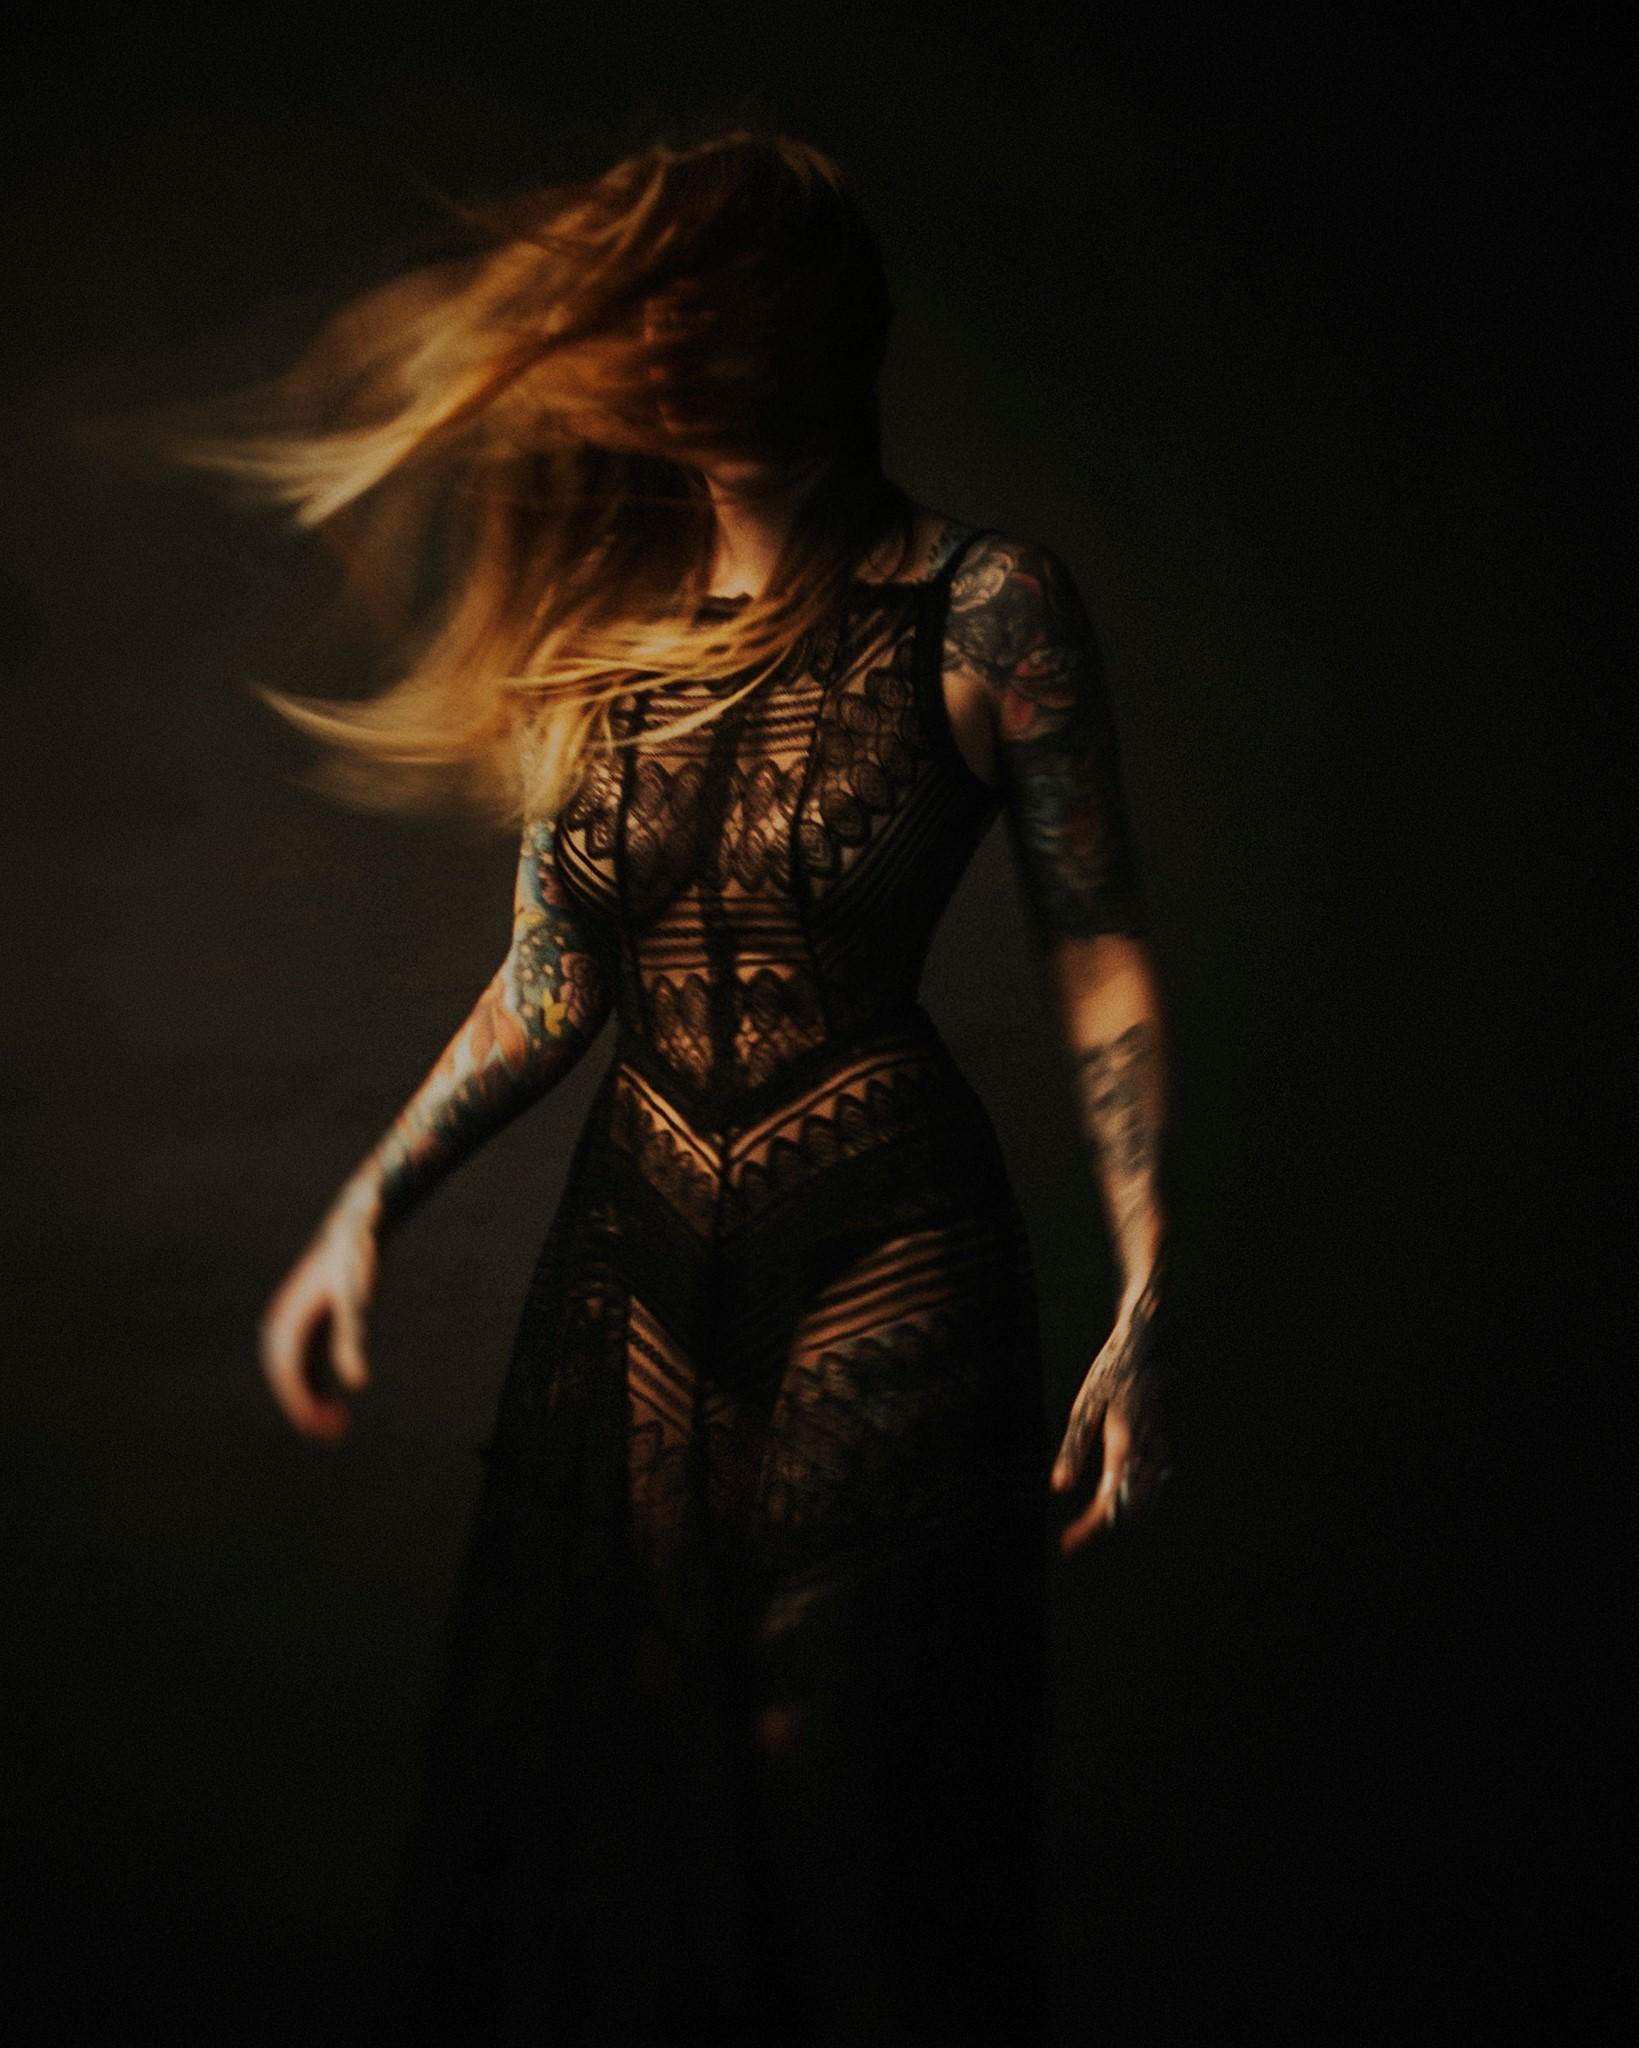 motion blur portrait.jpg